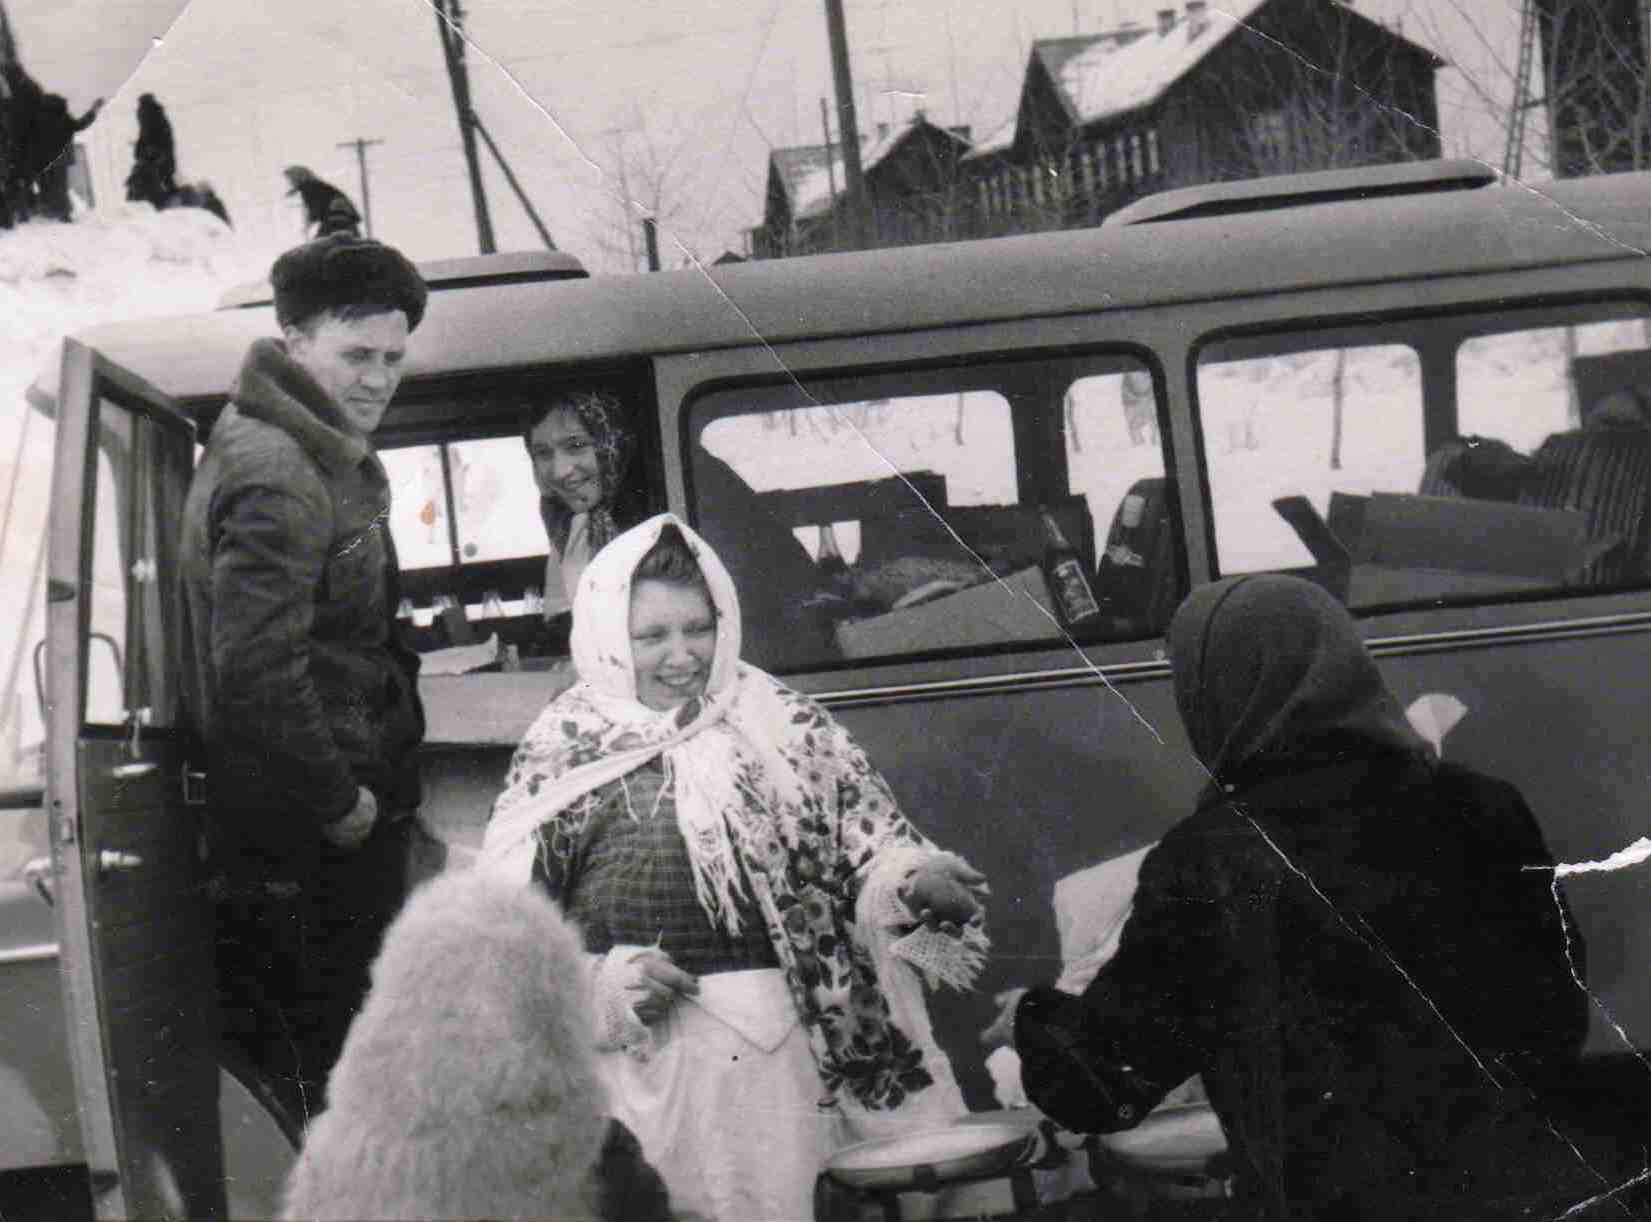 УАЗ. Проводы Русской Зимы, ст. Урдома